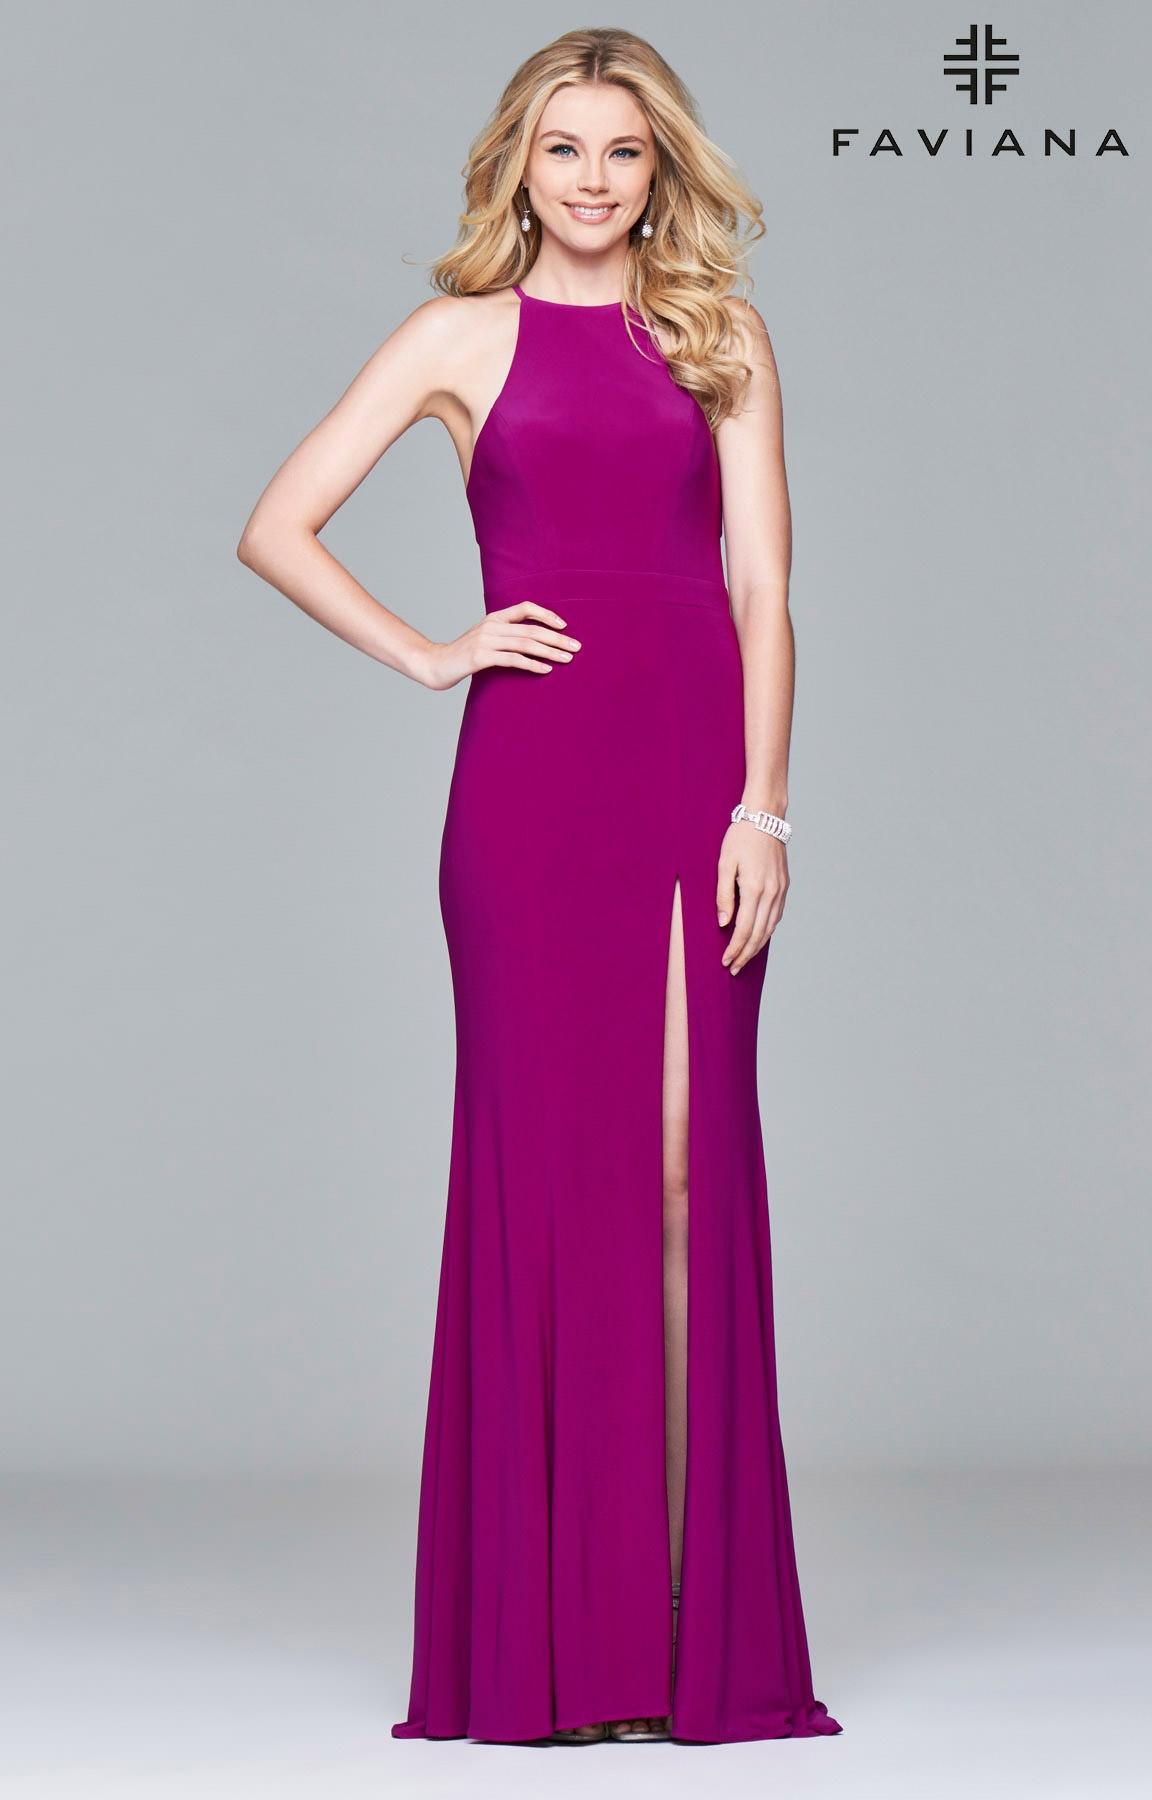 Excepcional High School Musical 3 Gabriella Prom Dress Colección de ...